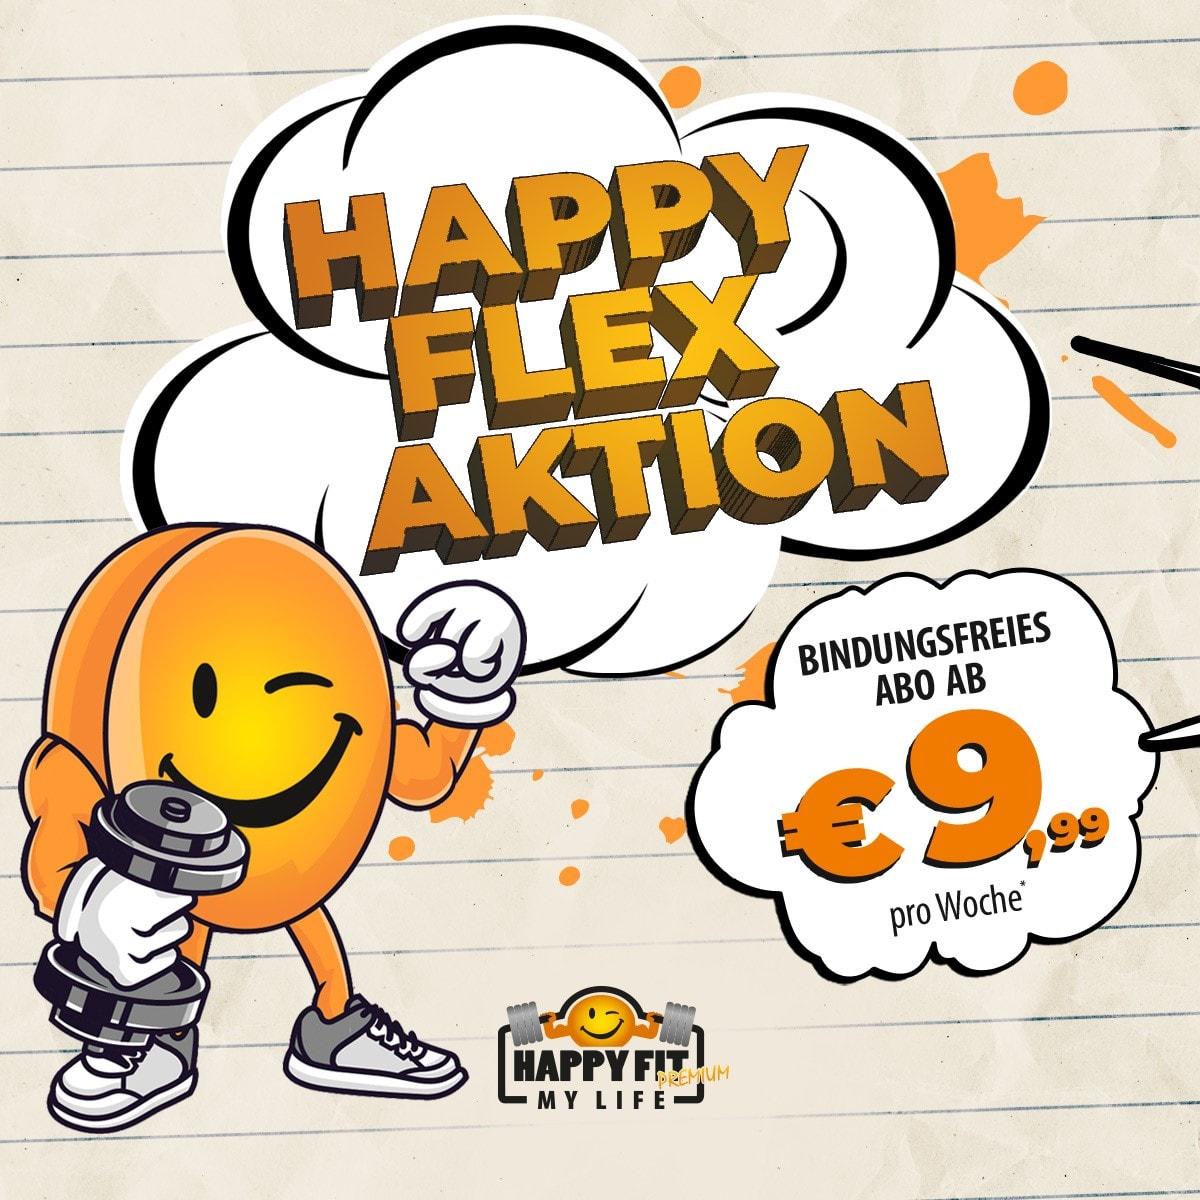 Happy Flex Aktion